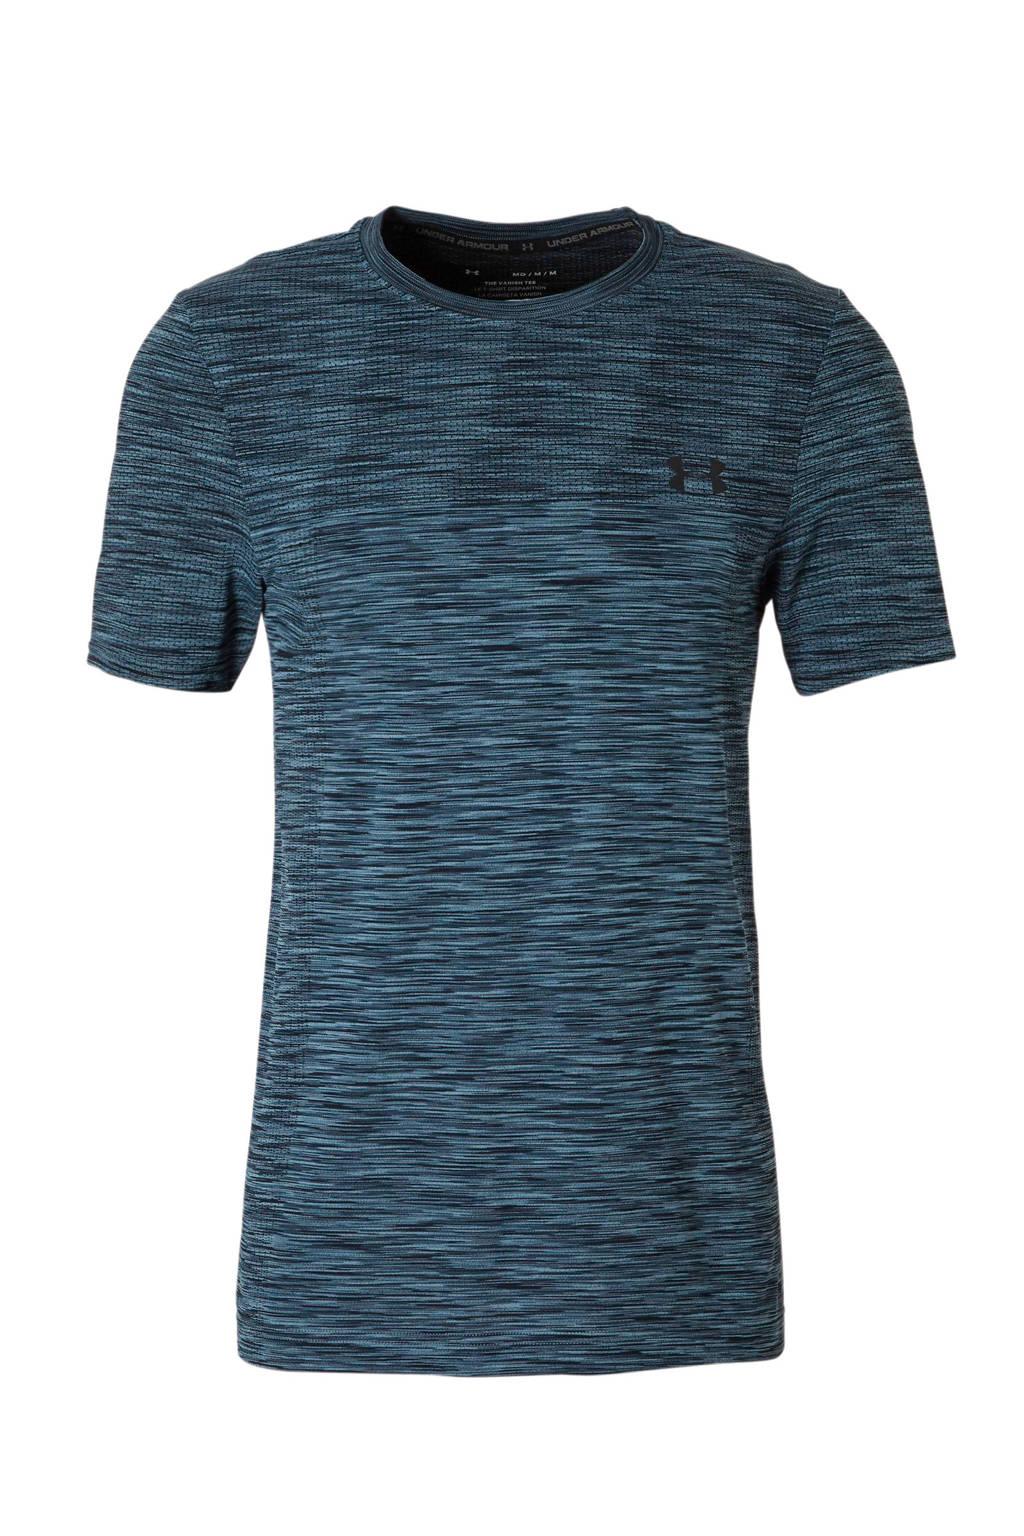 Under Armour   sport T-shirt, Blauw